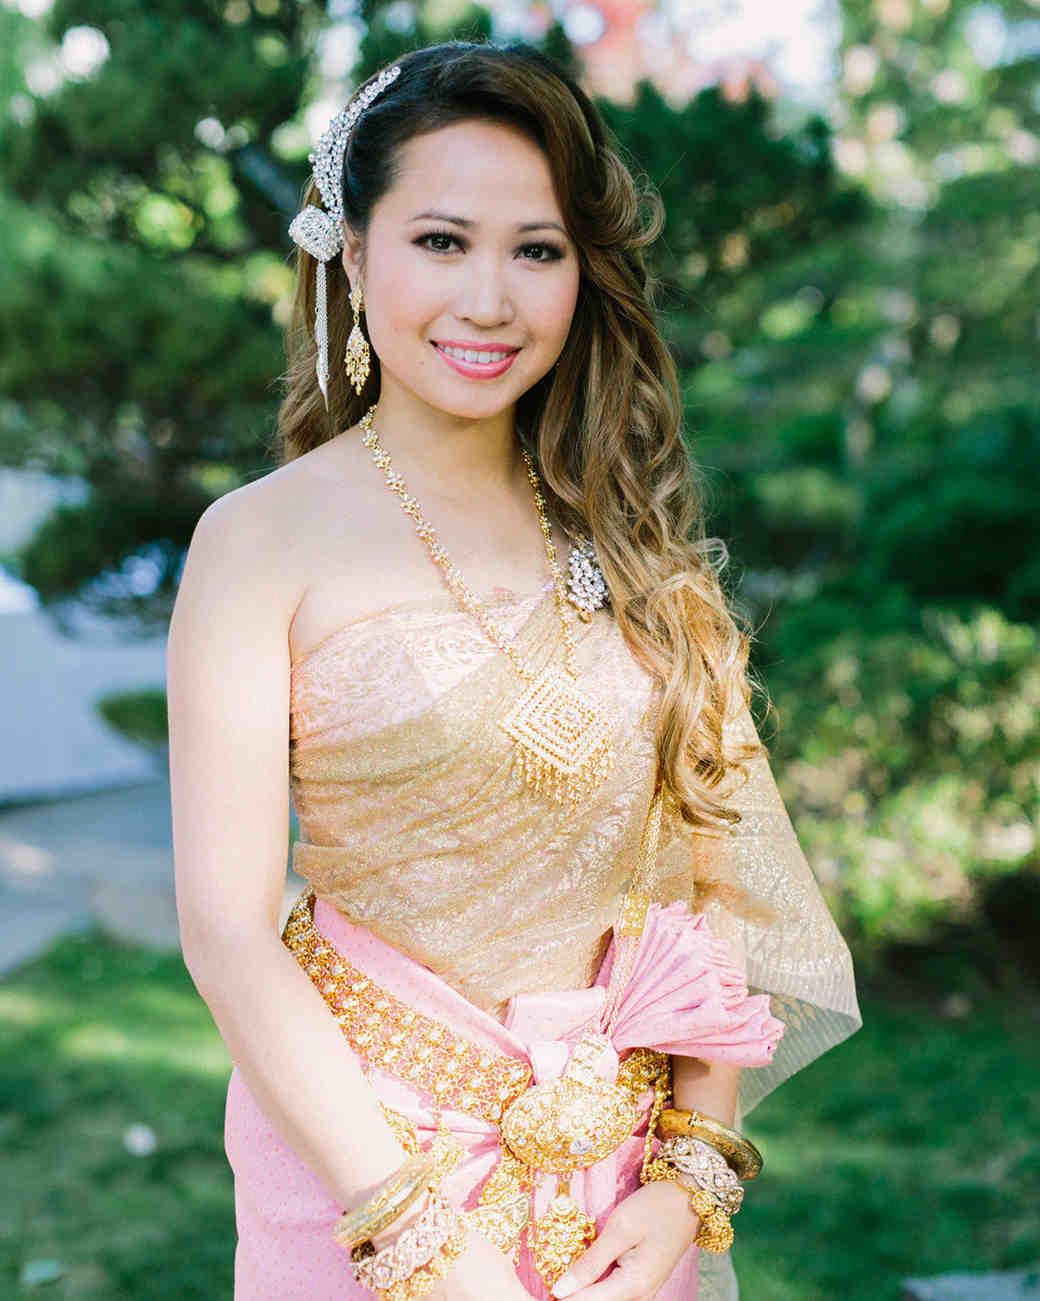 worldly wedding dresses luna de mare